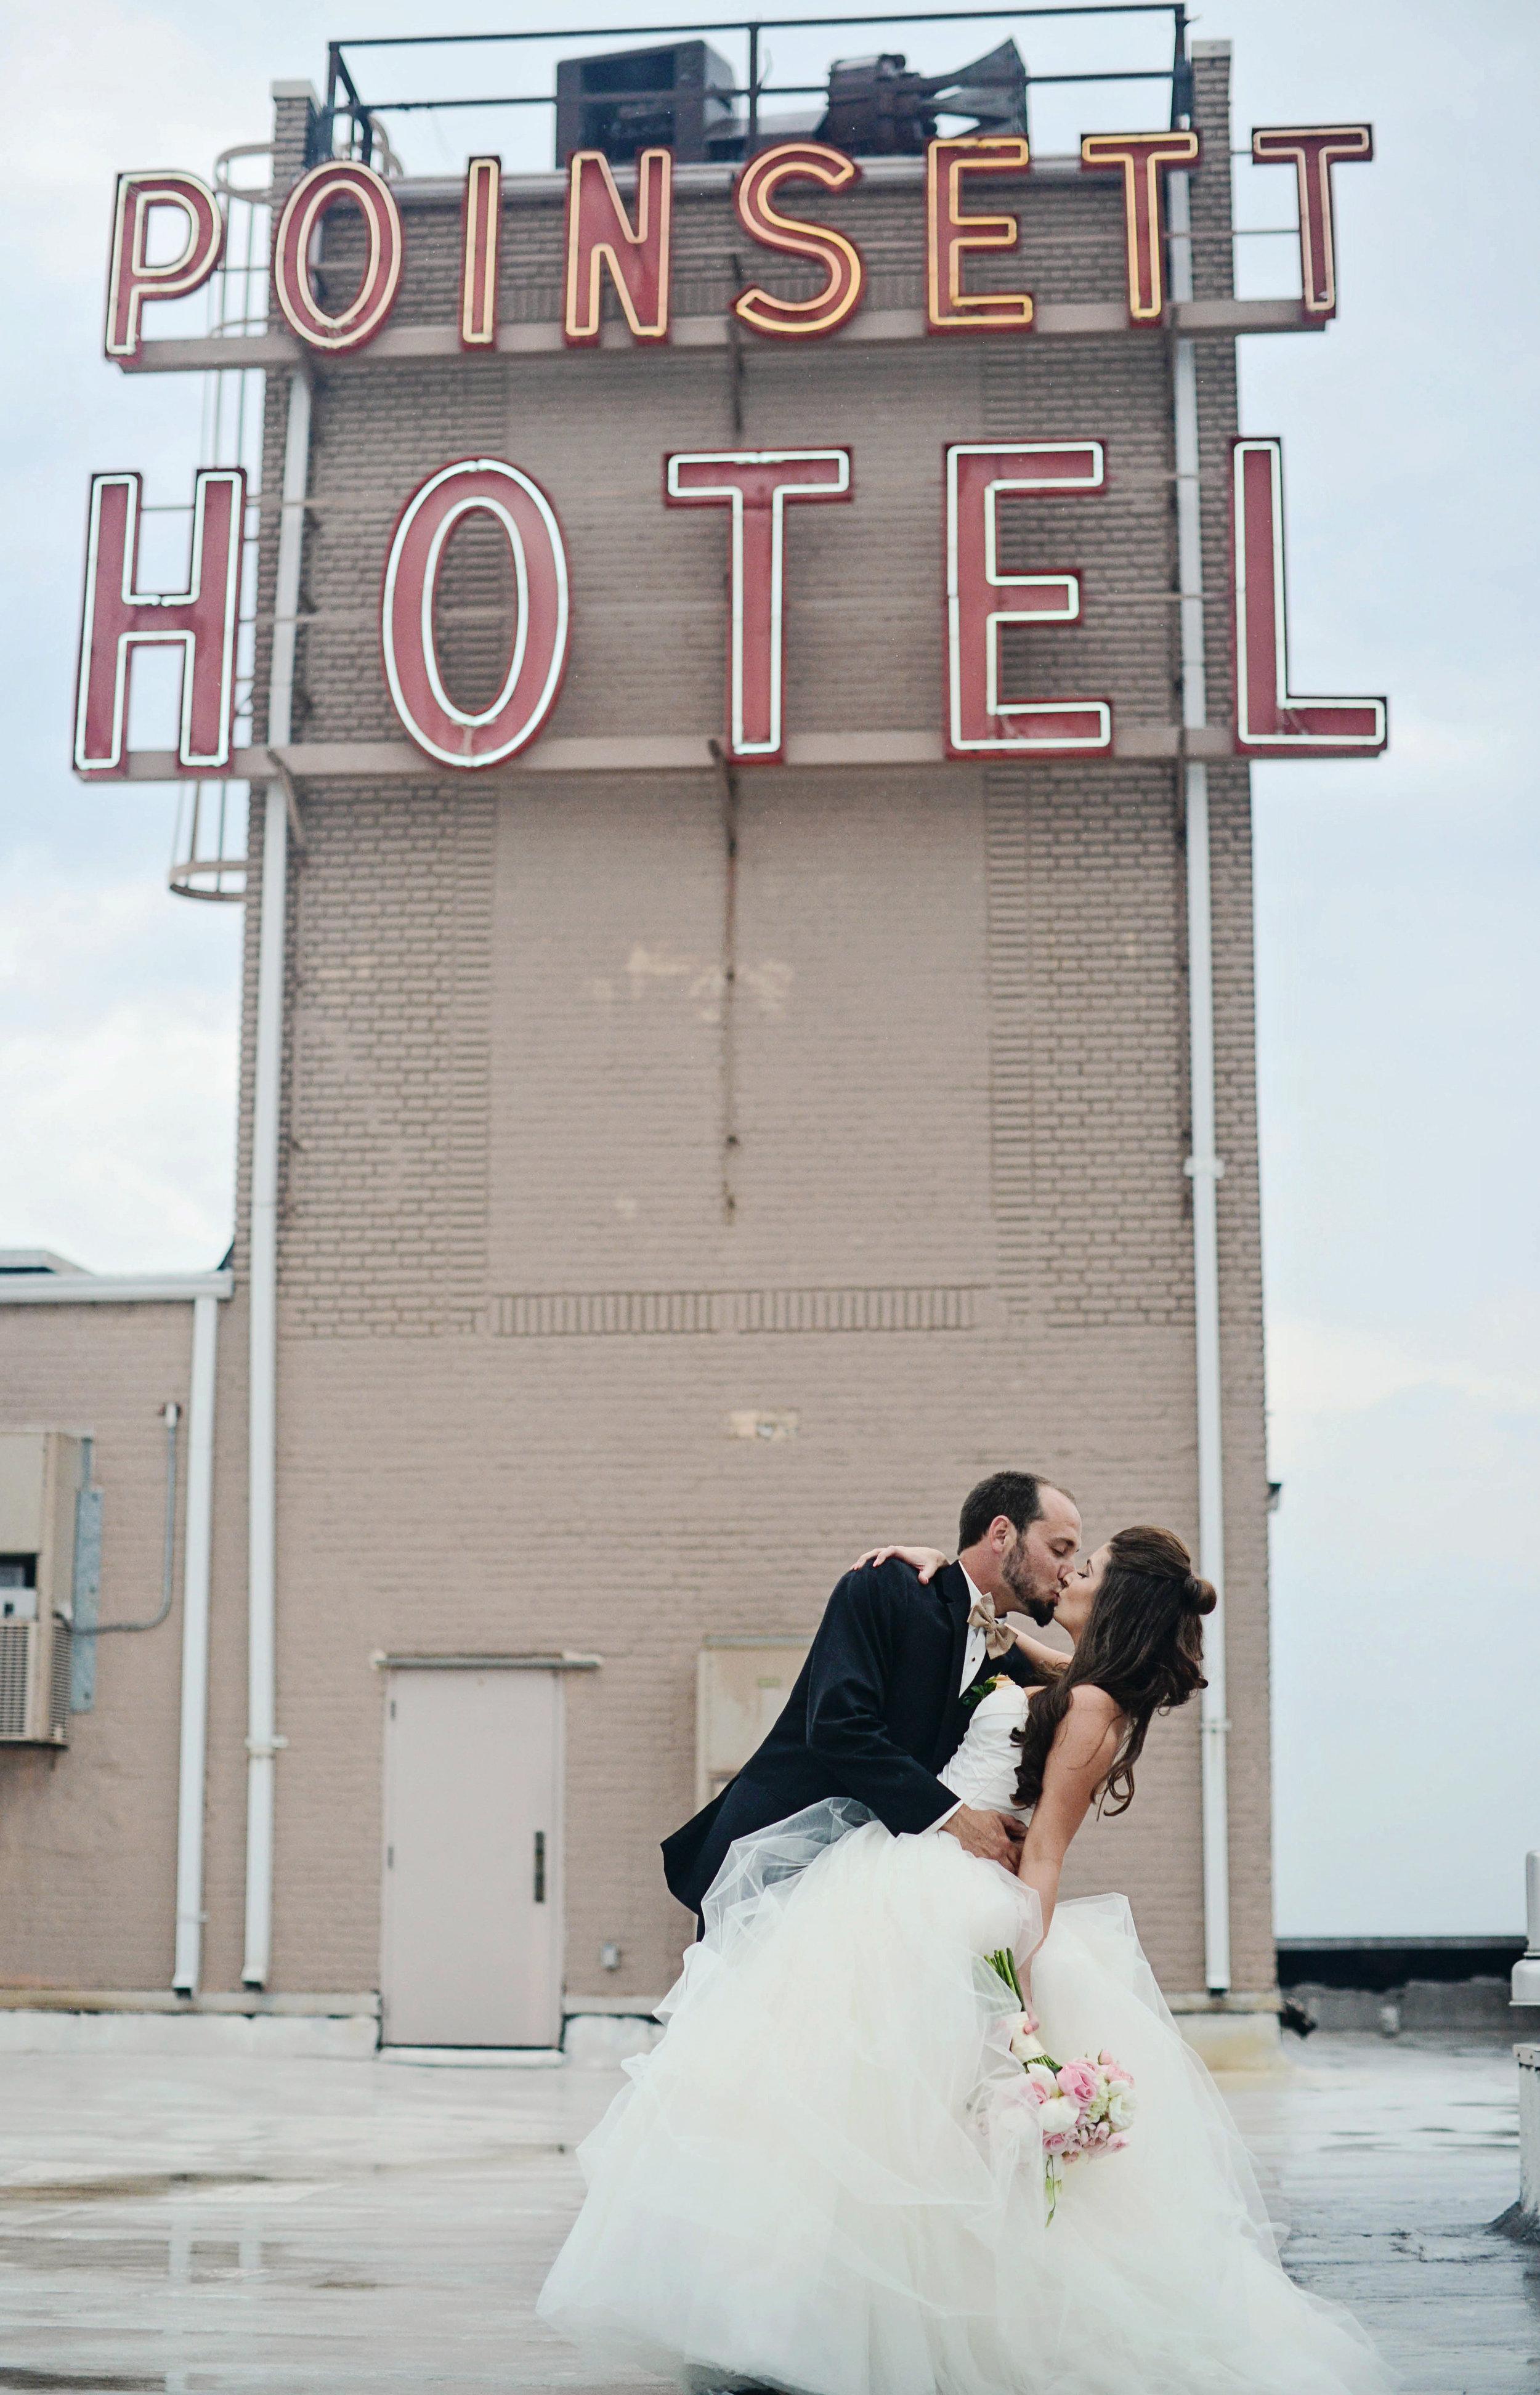 Laura+Thomas{Married}_MiraPhotographs-169.jpg